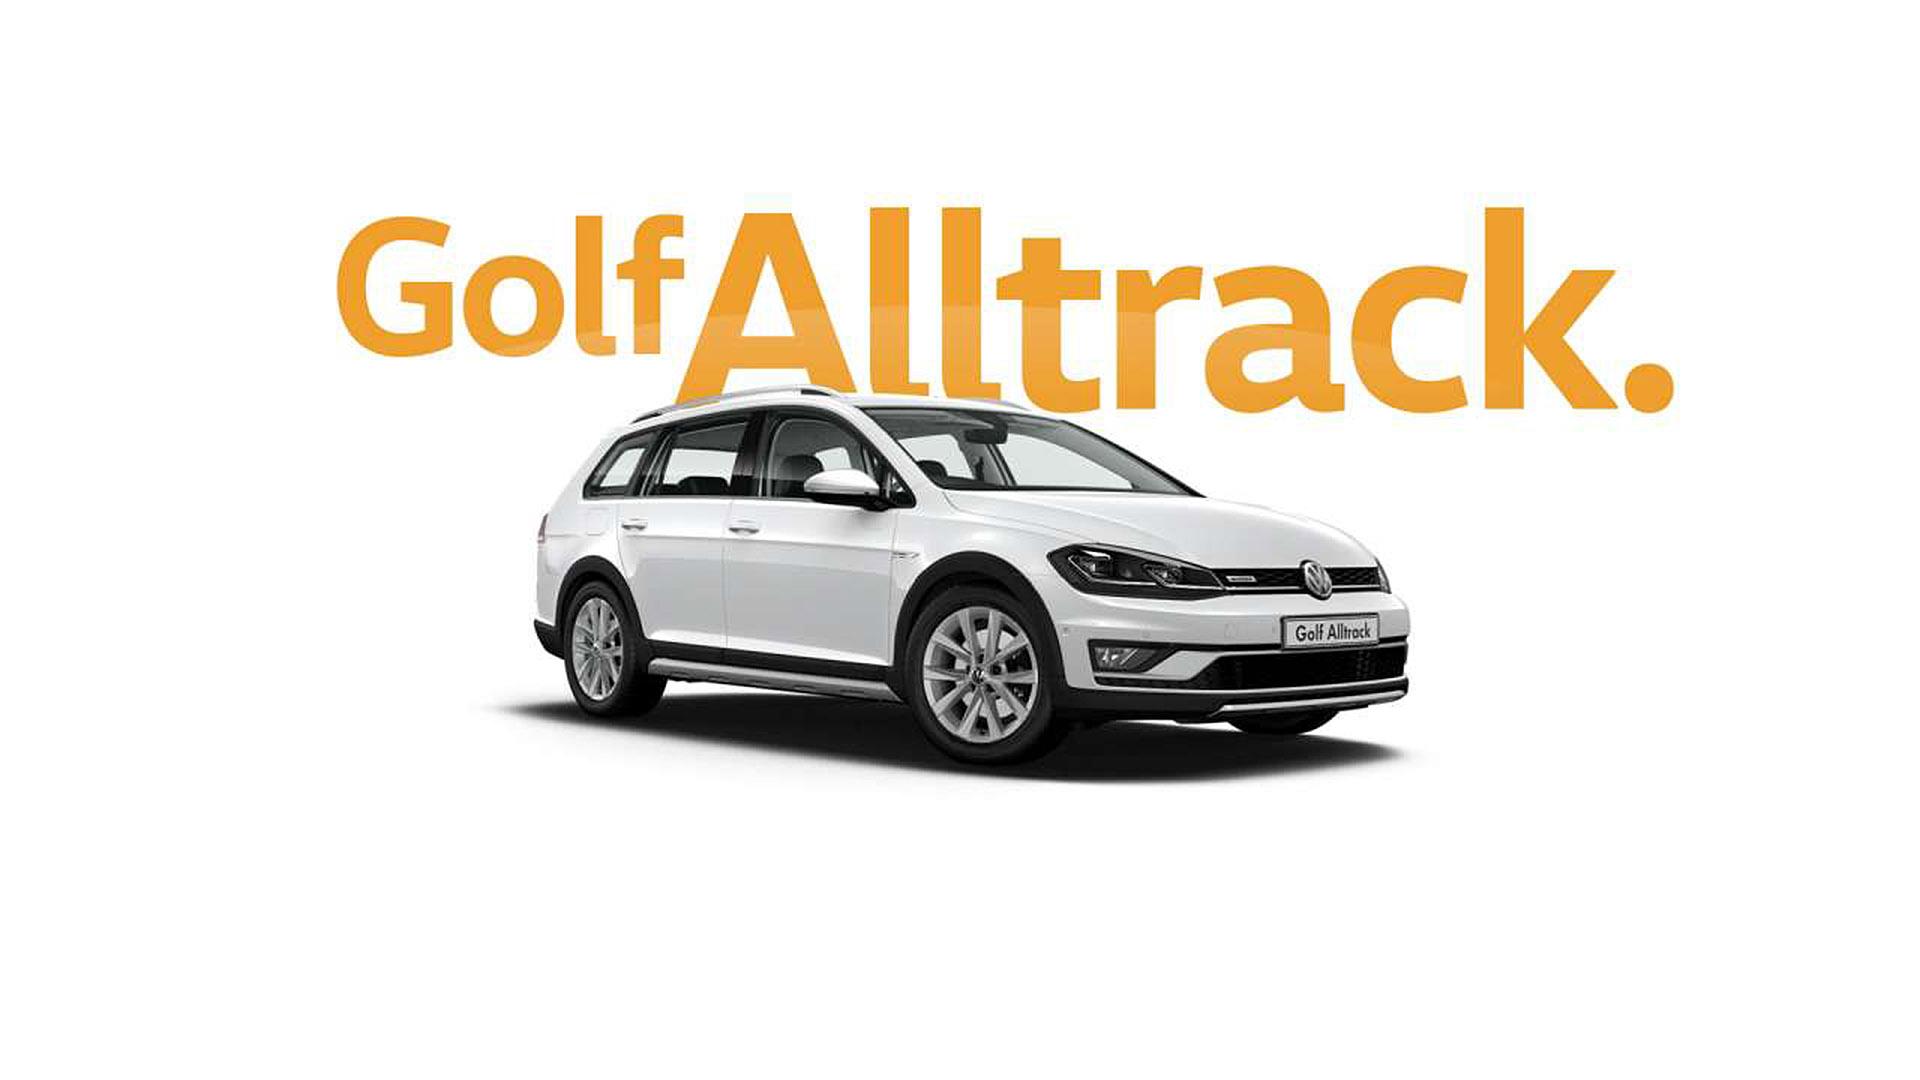 Golf Alltrack All tracks lead to adventure.